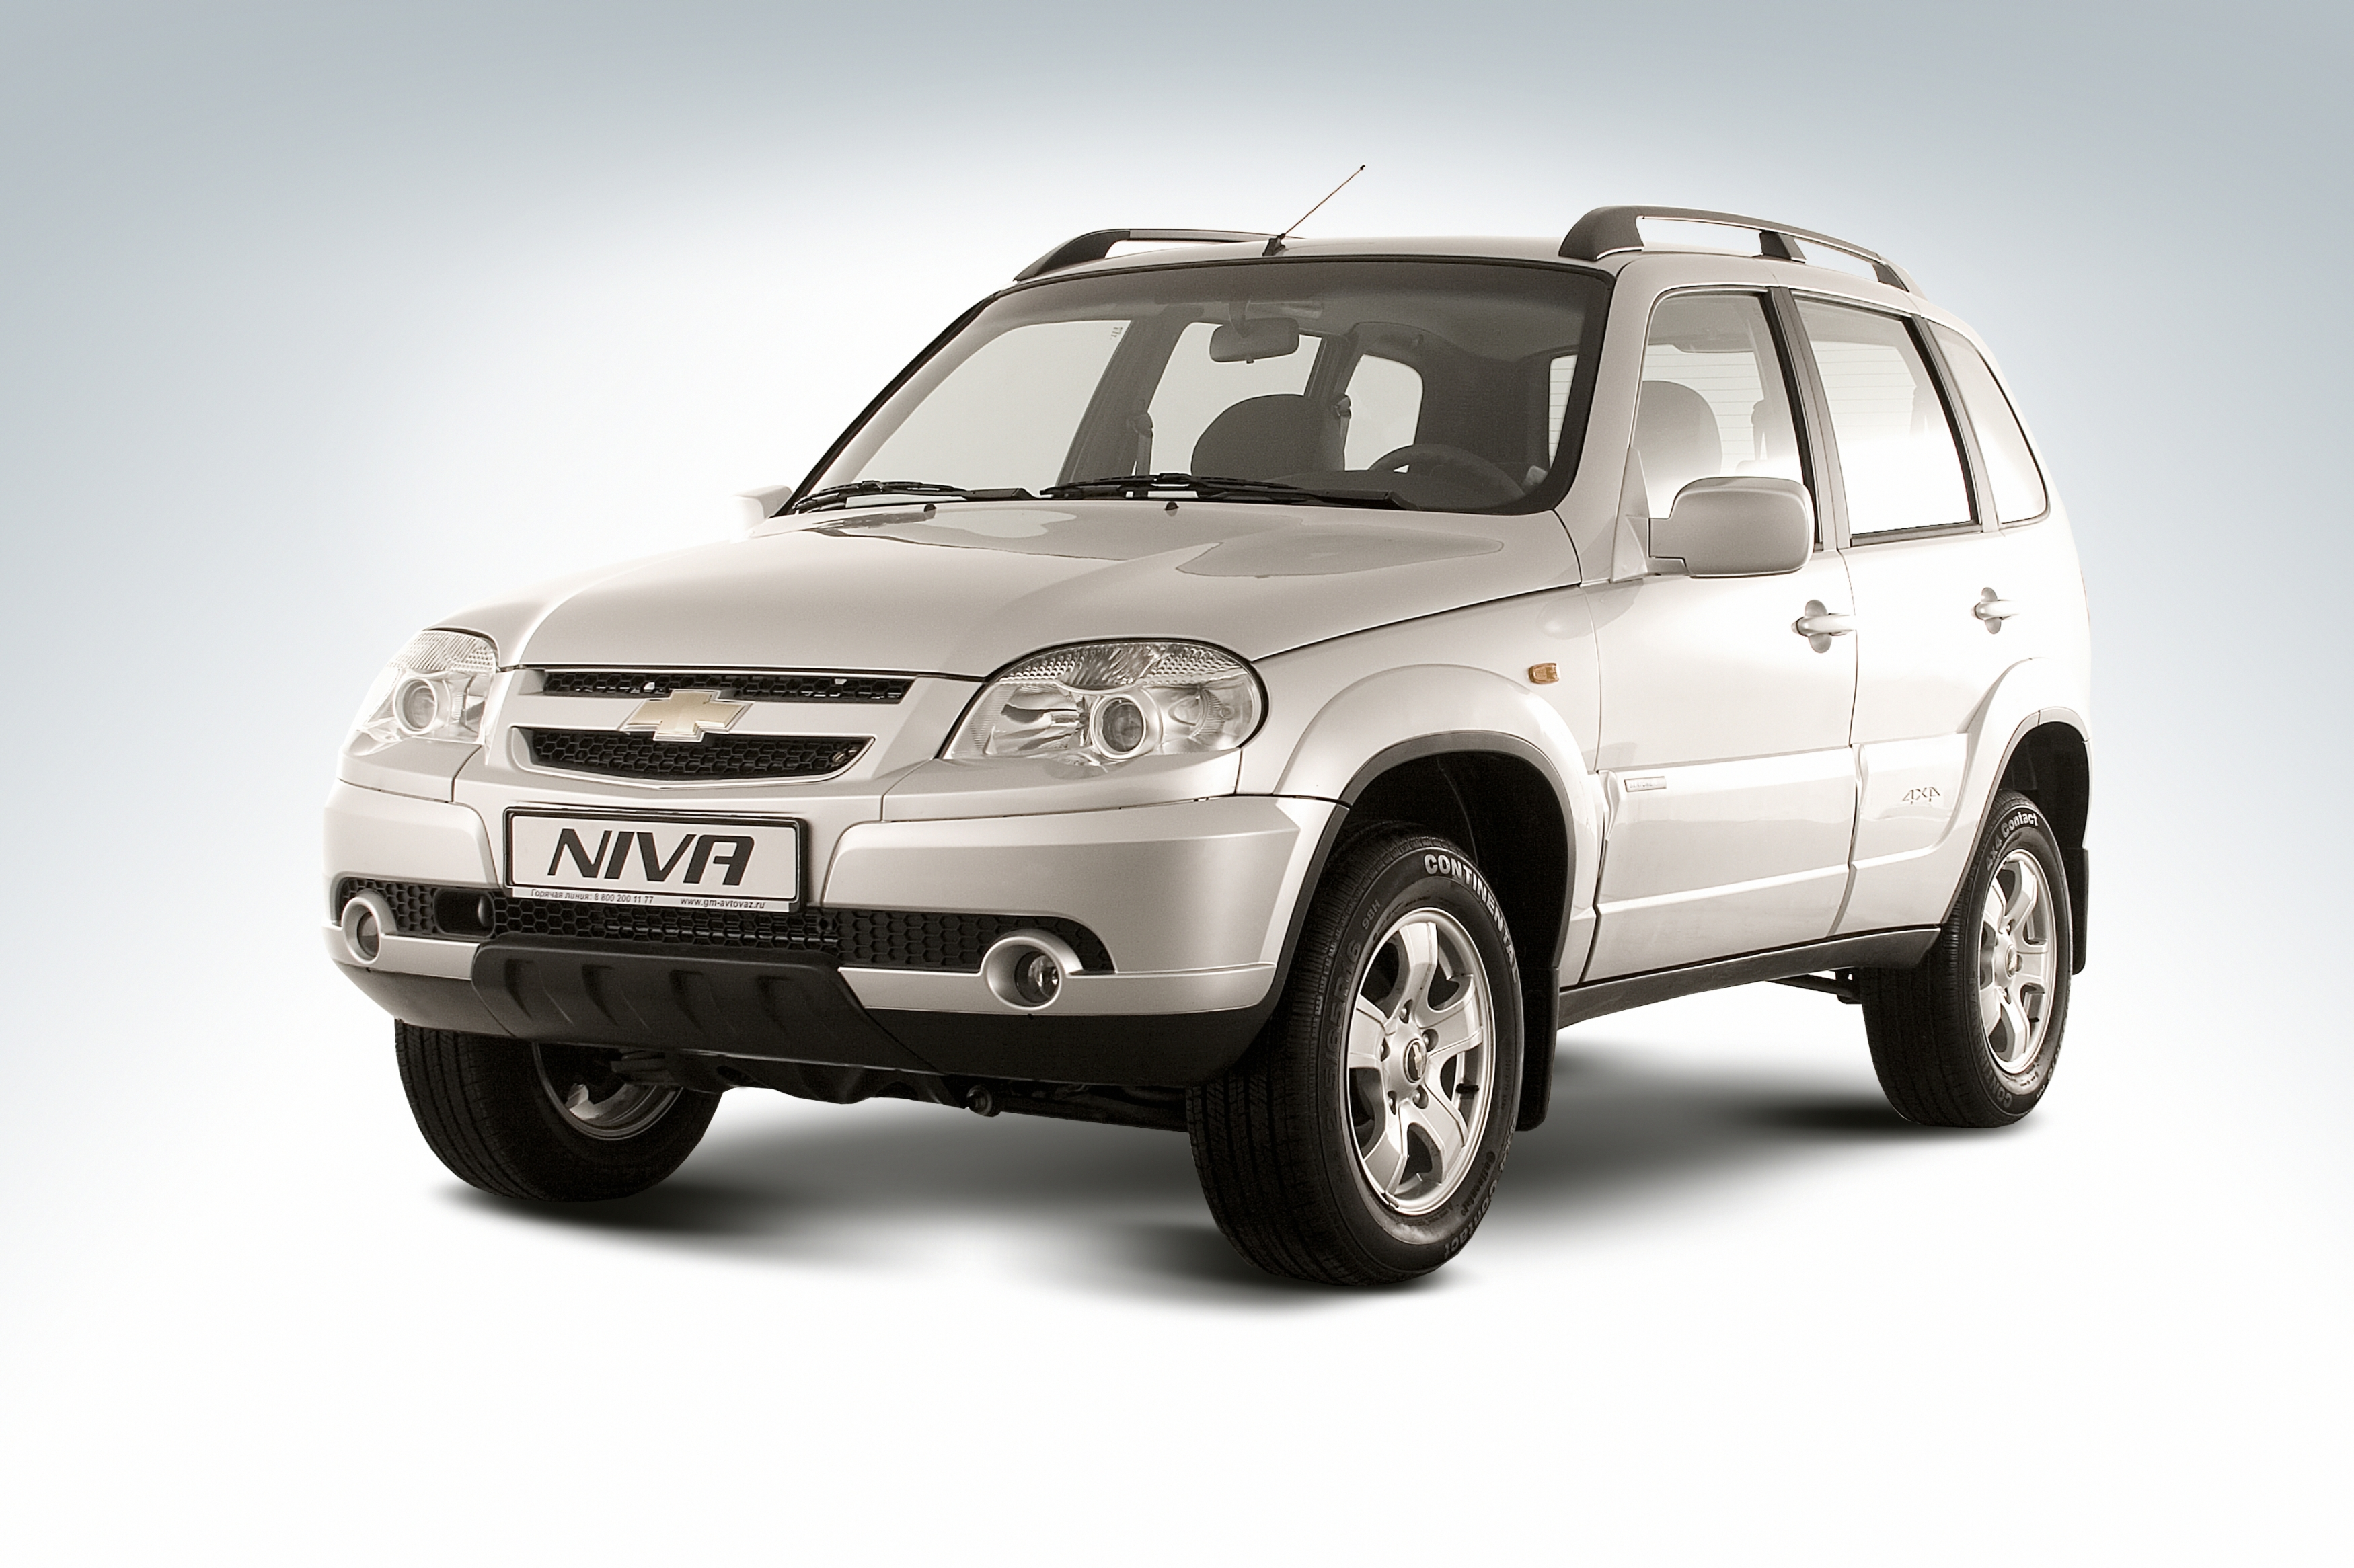 O Chevrolet Niva foi feito para o mercado russo